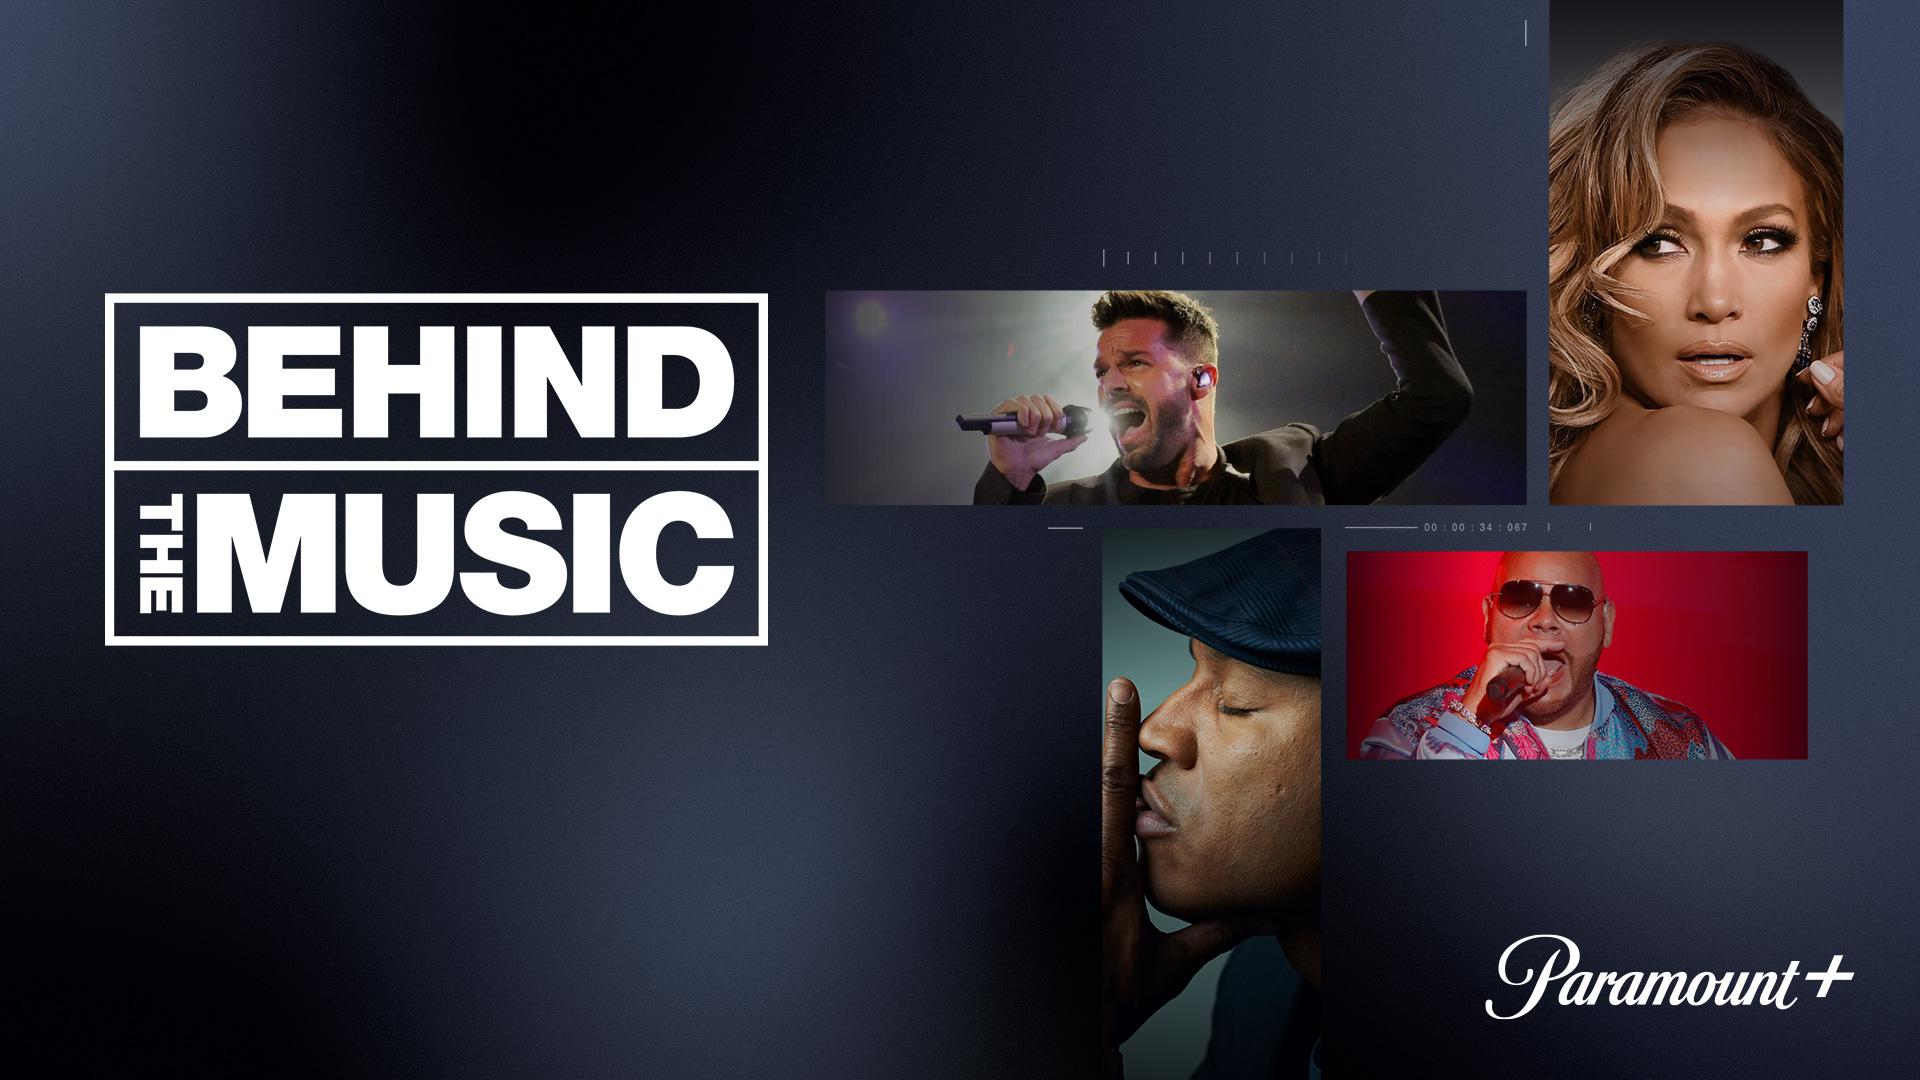 Behind The Music Season 1